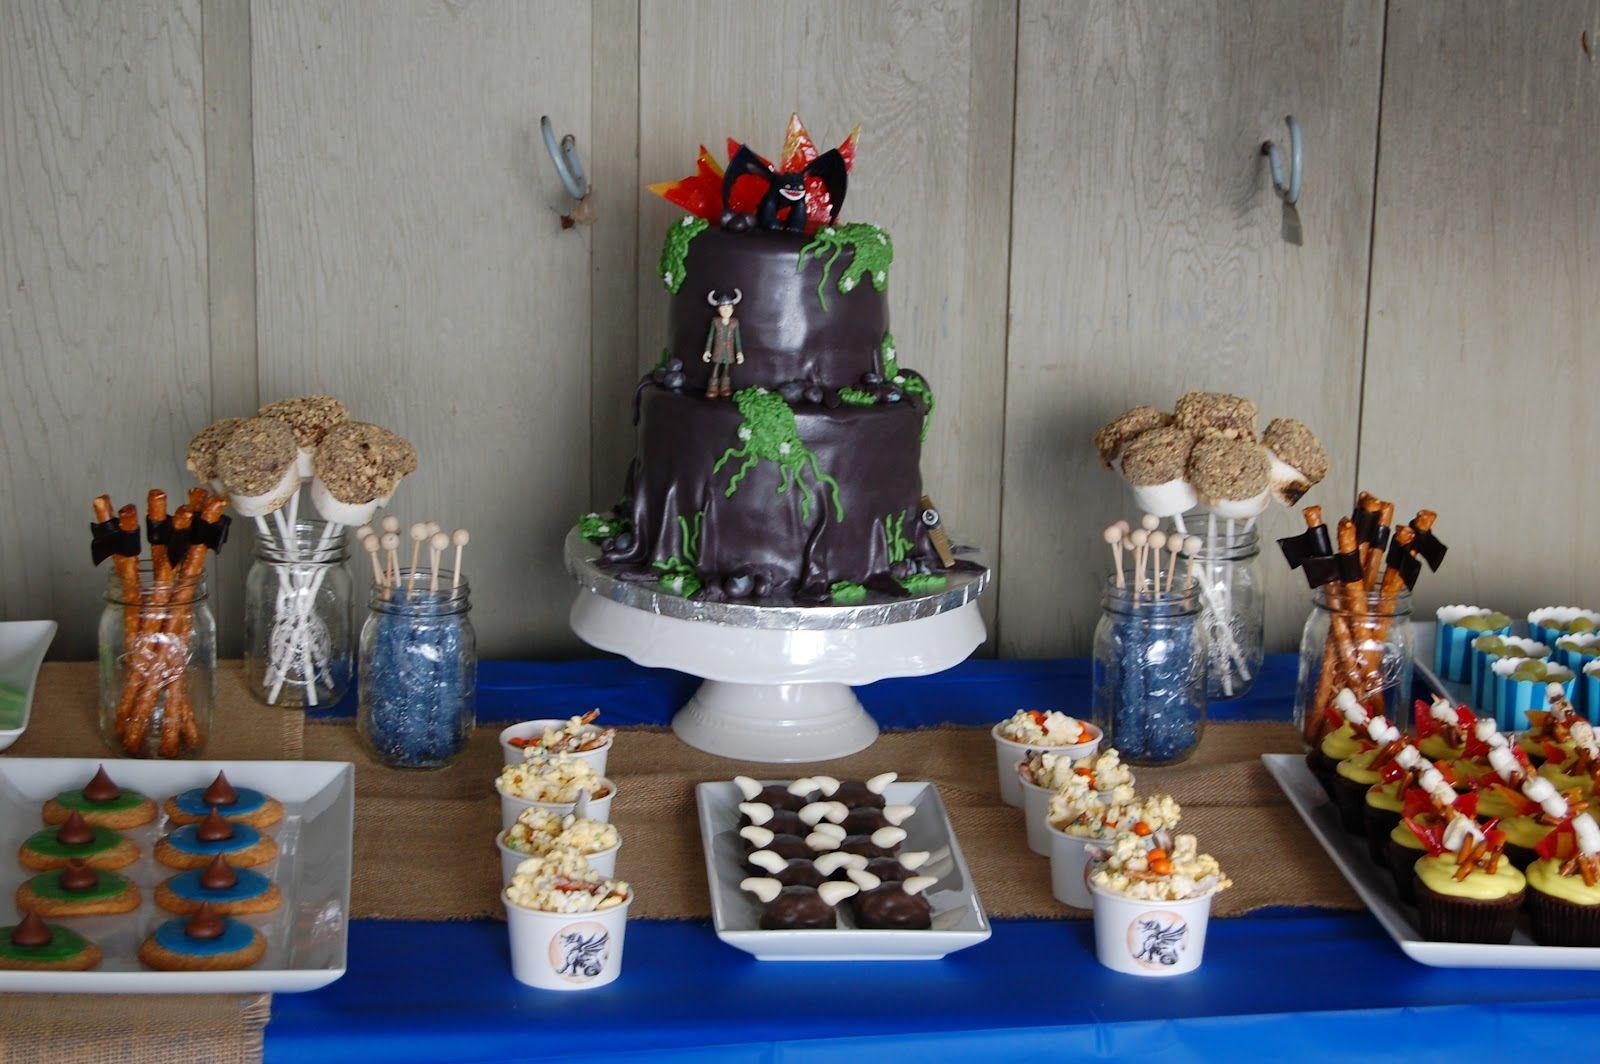 How to train your dragon birthday cake google otsing johanni how to train your dragon birthday cake google otsing ccuart Images